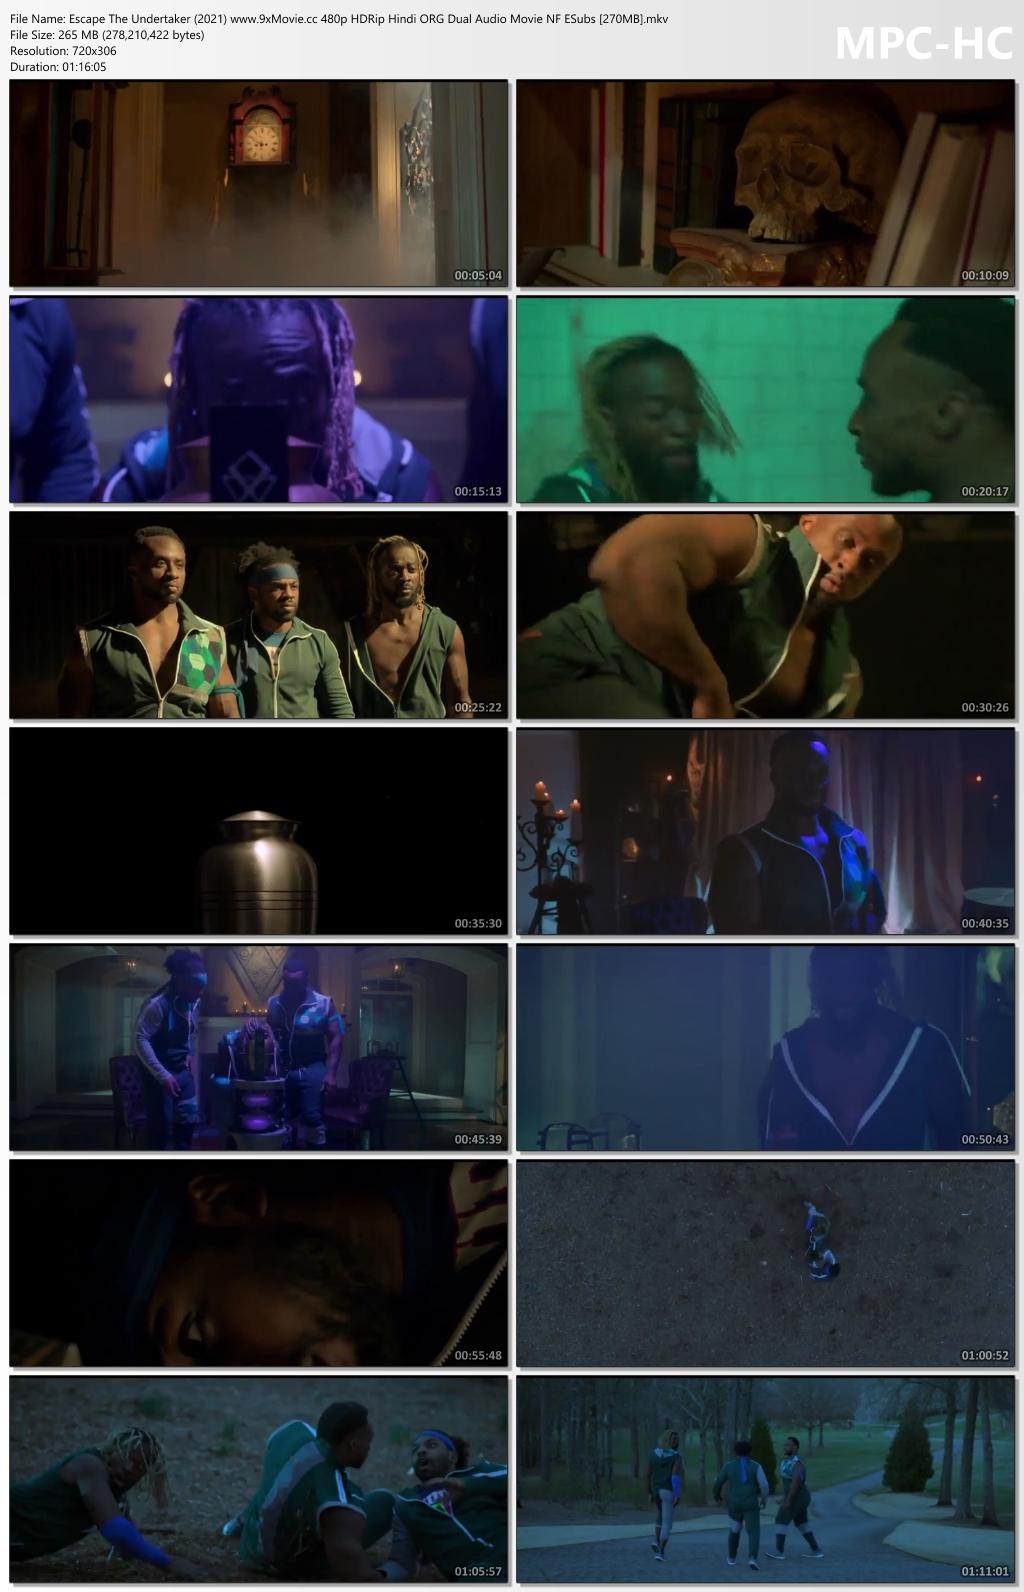 Escape-The-Undertaker-2021-www-9x-Movie-cc-480p-HDRip-Hindi-ORG-Dual-Audio-Movie-NF-ESubs-270-MB-mkv